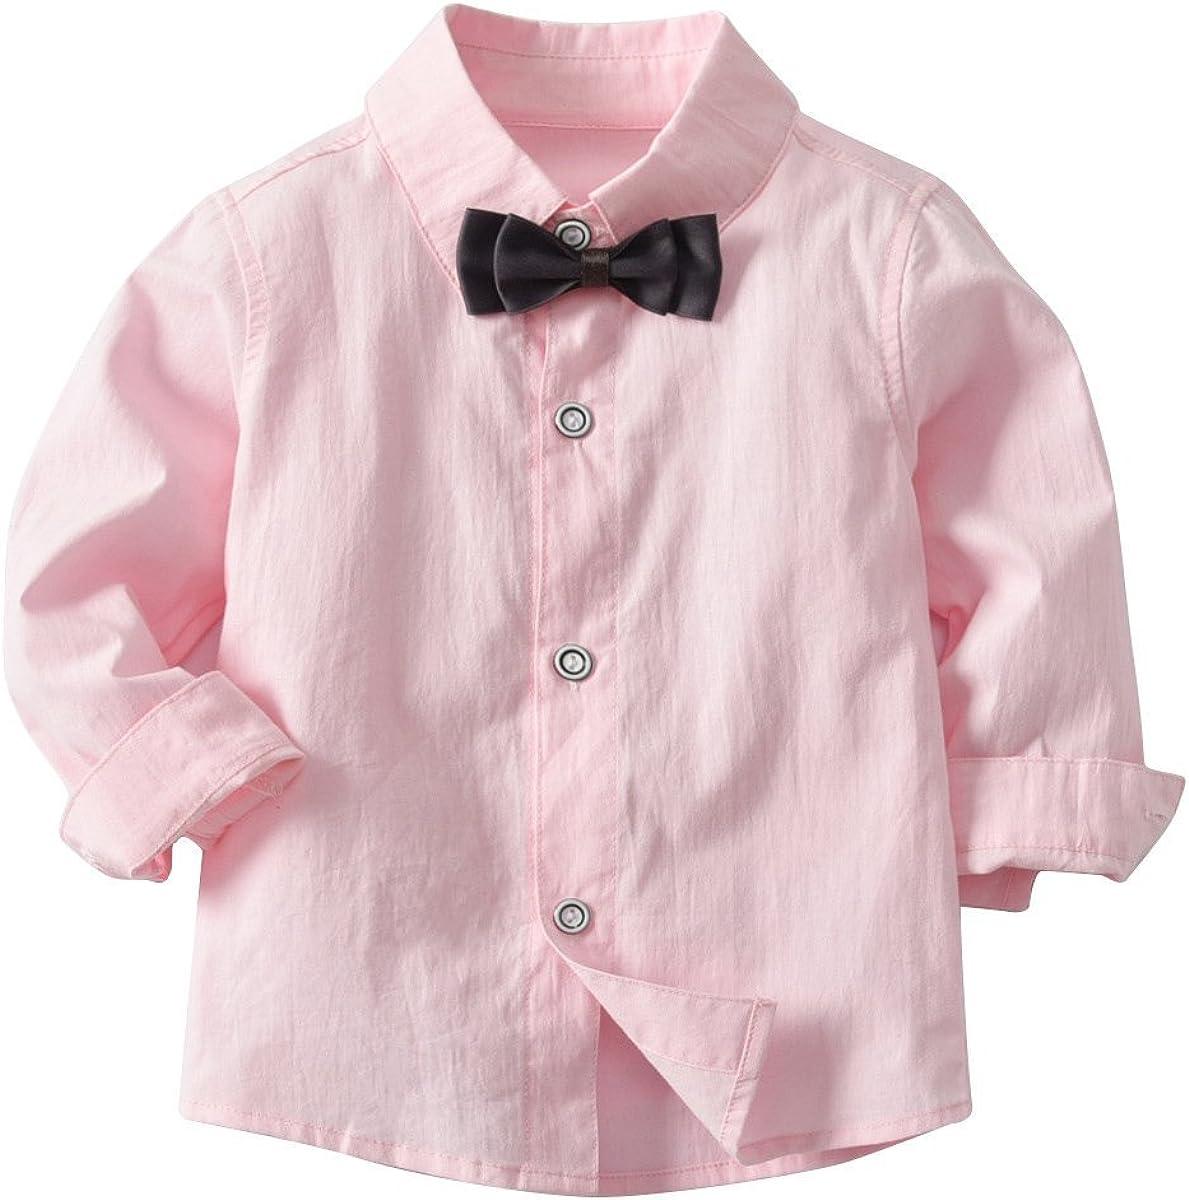 Waistcoat Kid Boy Formal Suit Long Sleeve Shirt with Bow Tie Long Pants 3Pcs